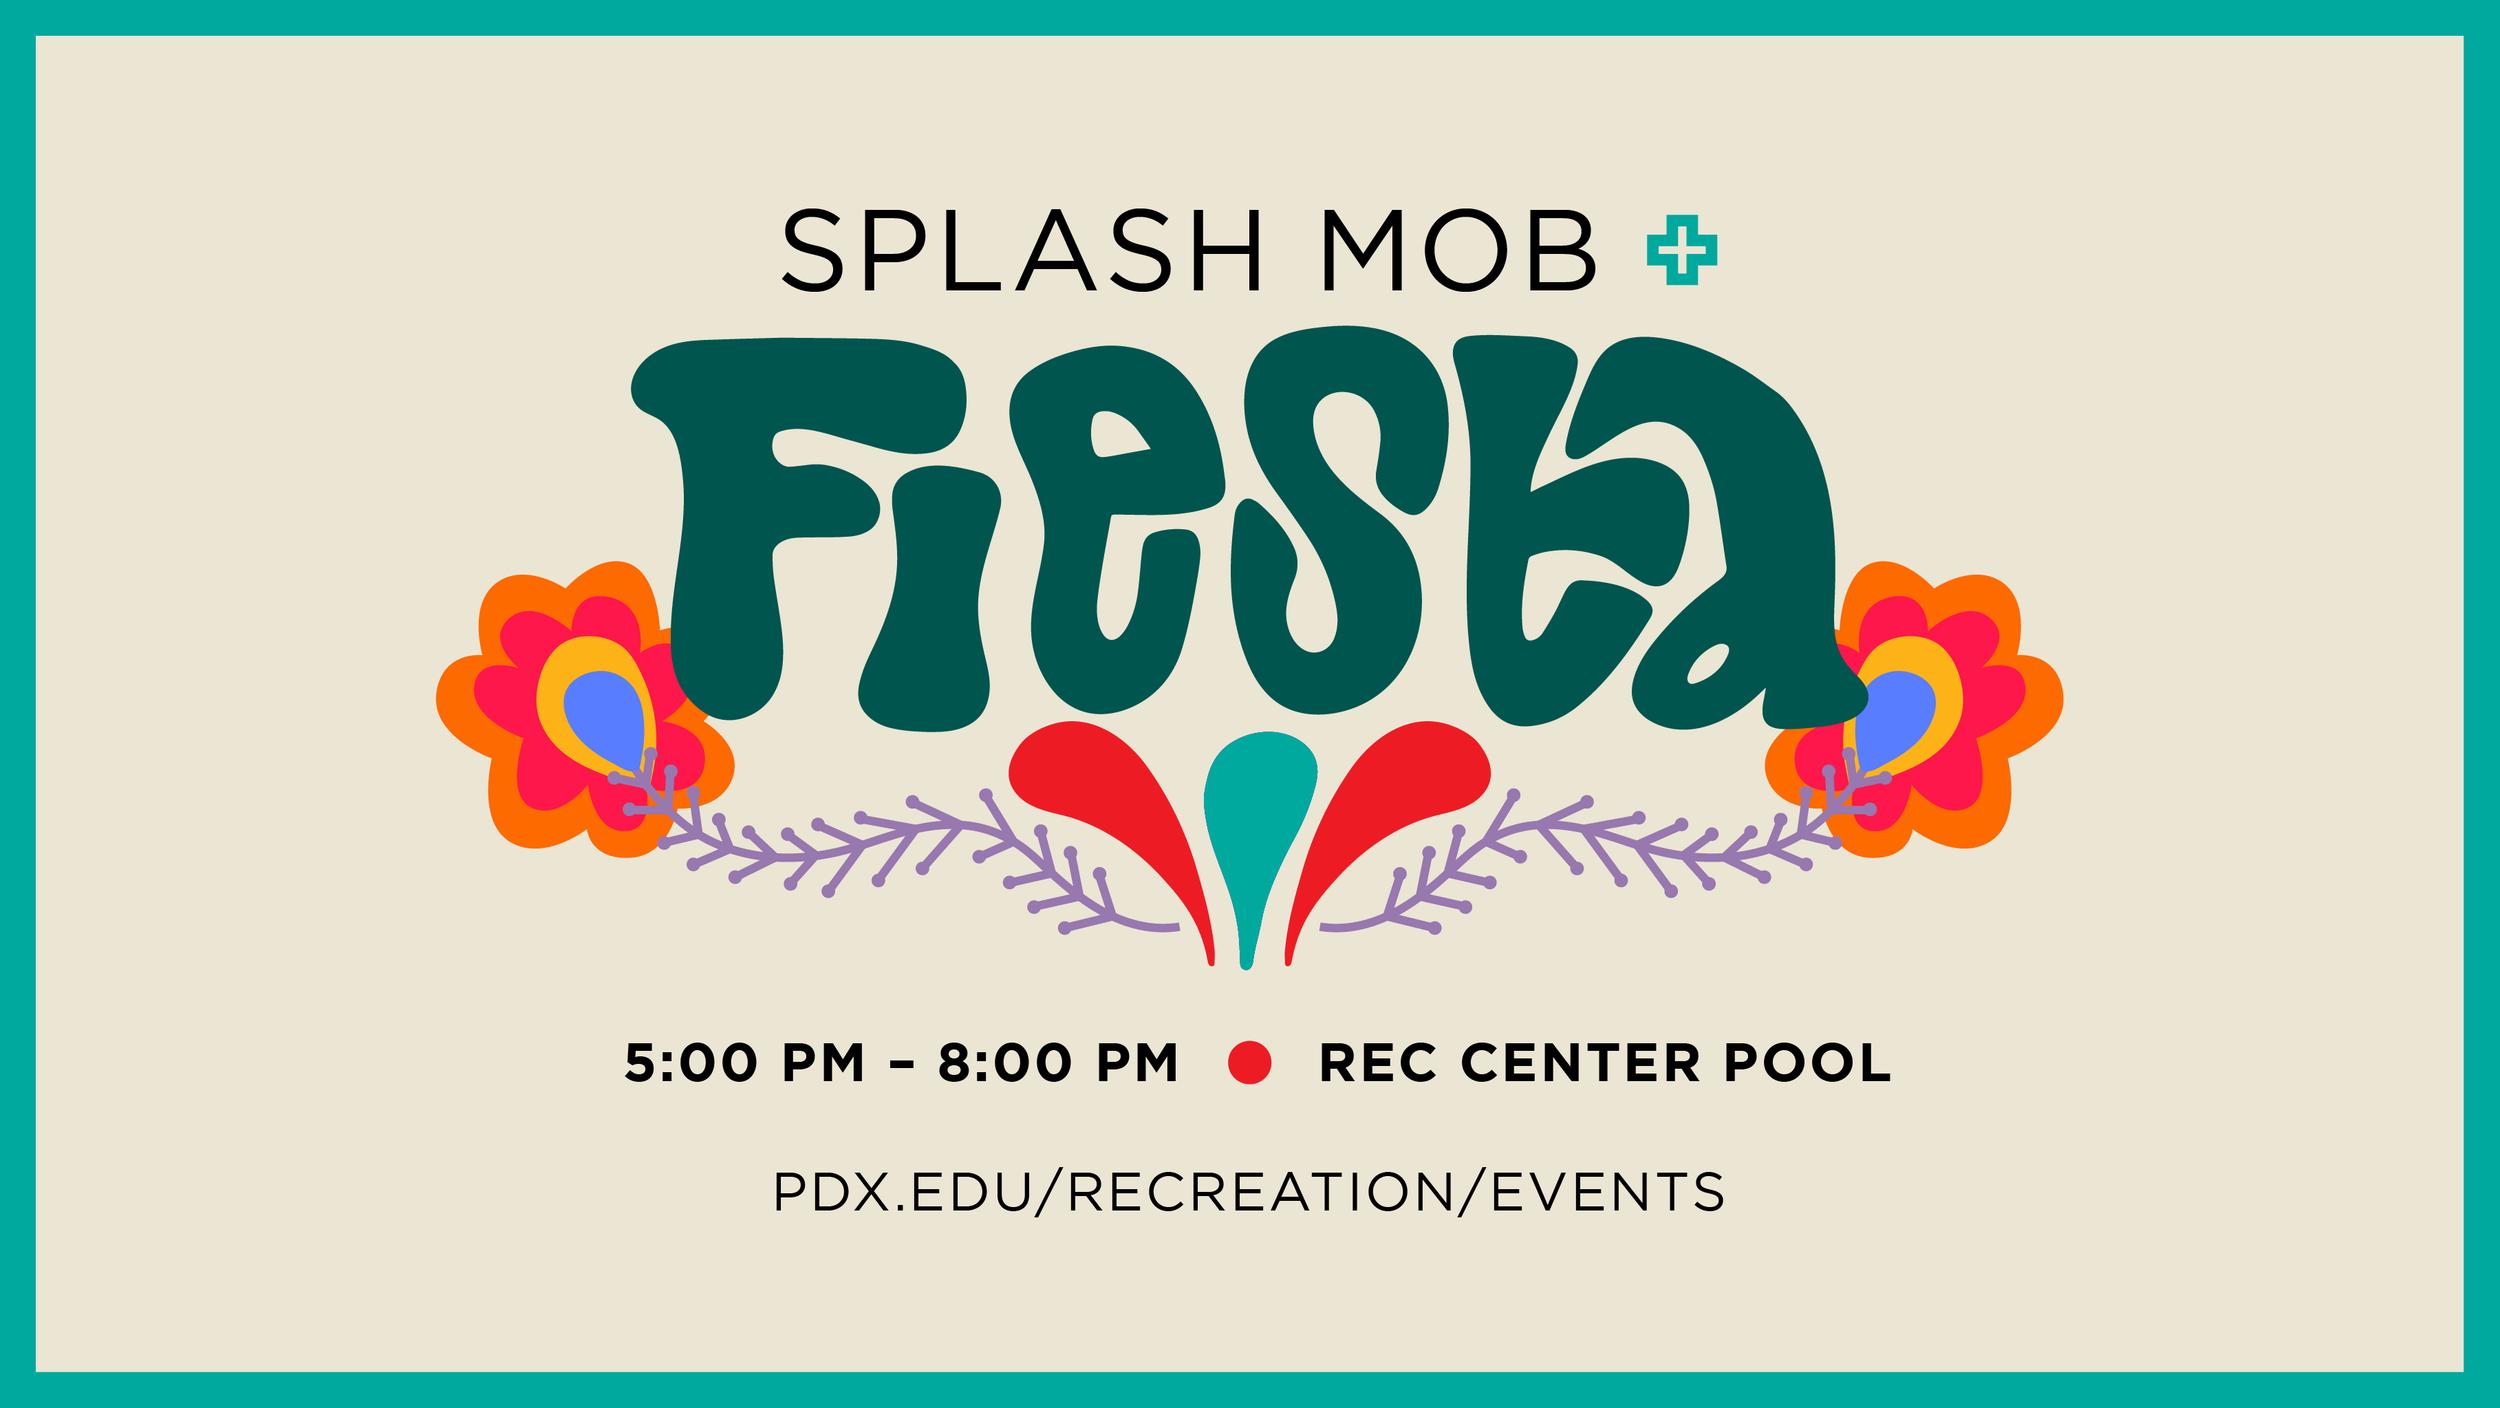 SplashMob+Fiesta_DigitalSignage-01.png